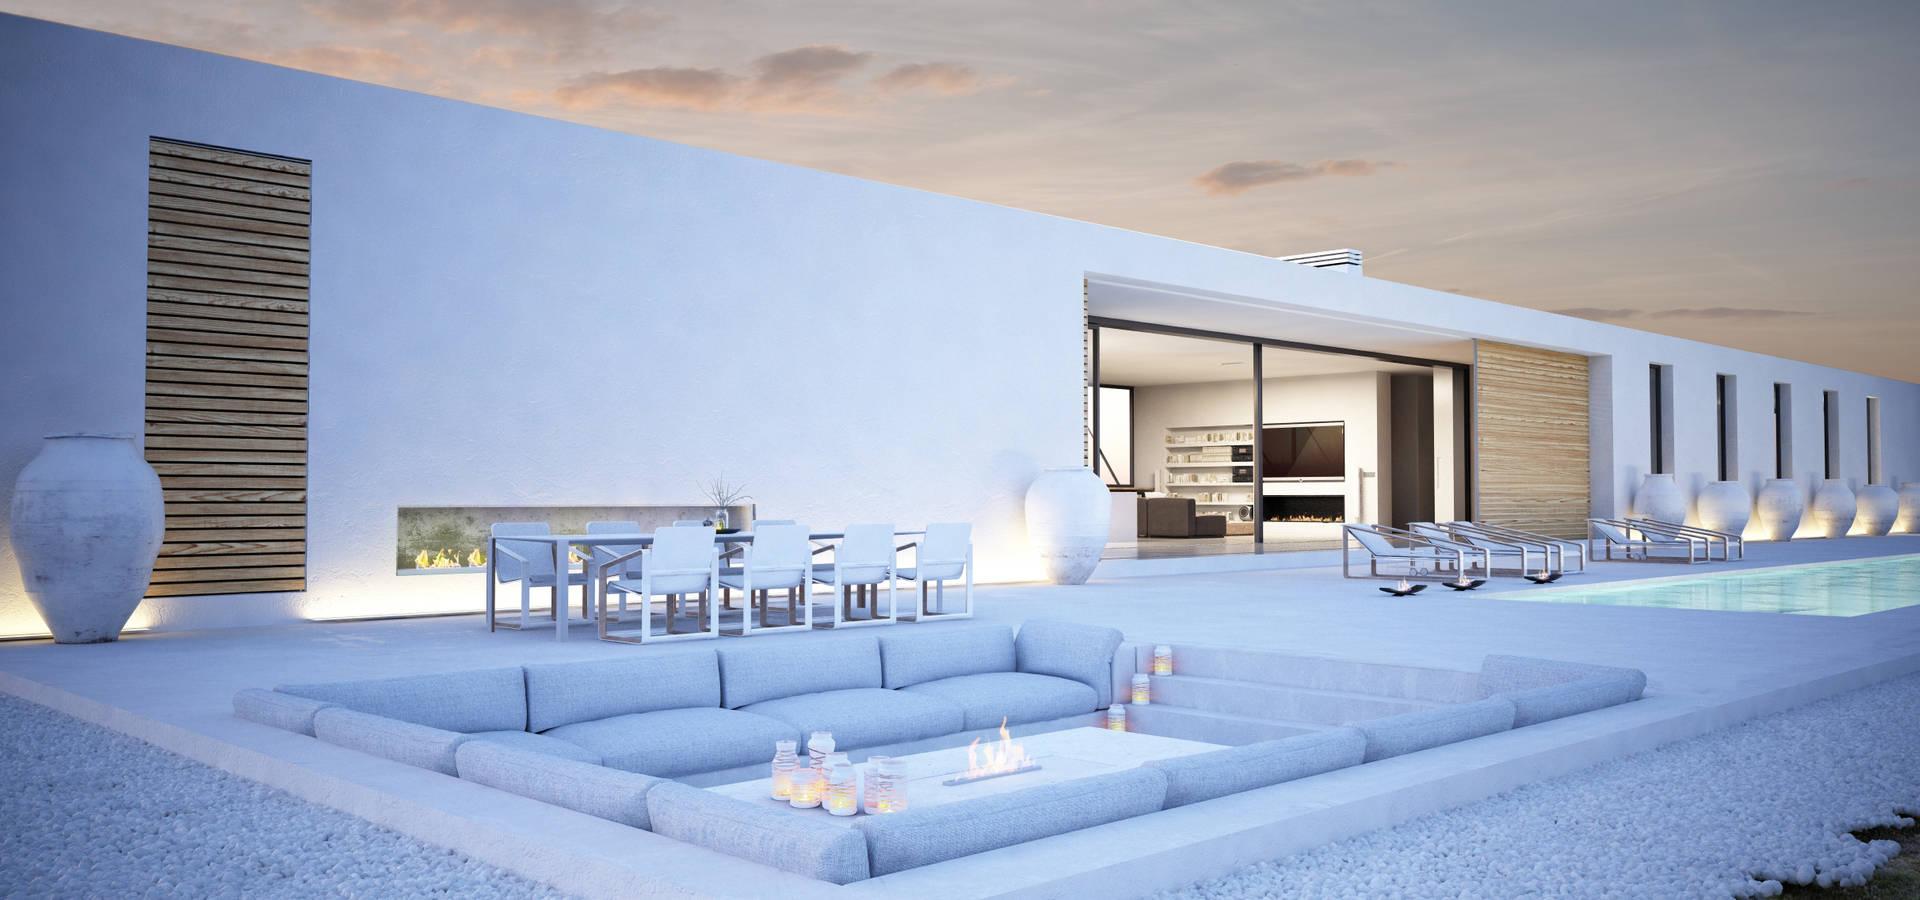 DUE Architecture & Design